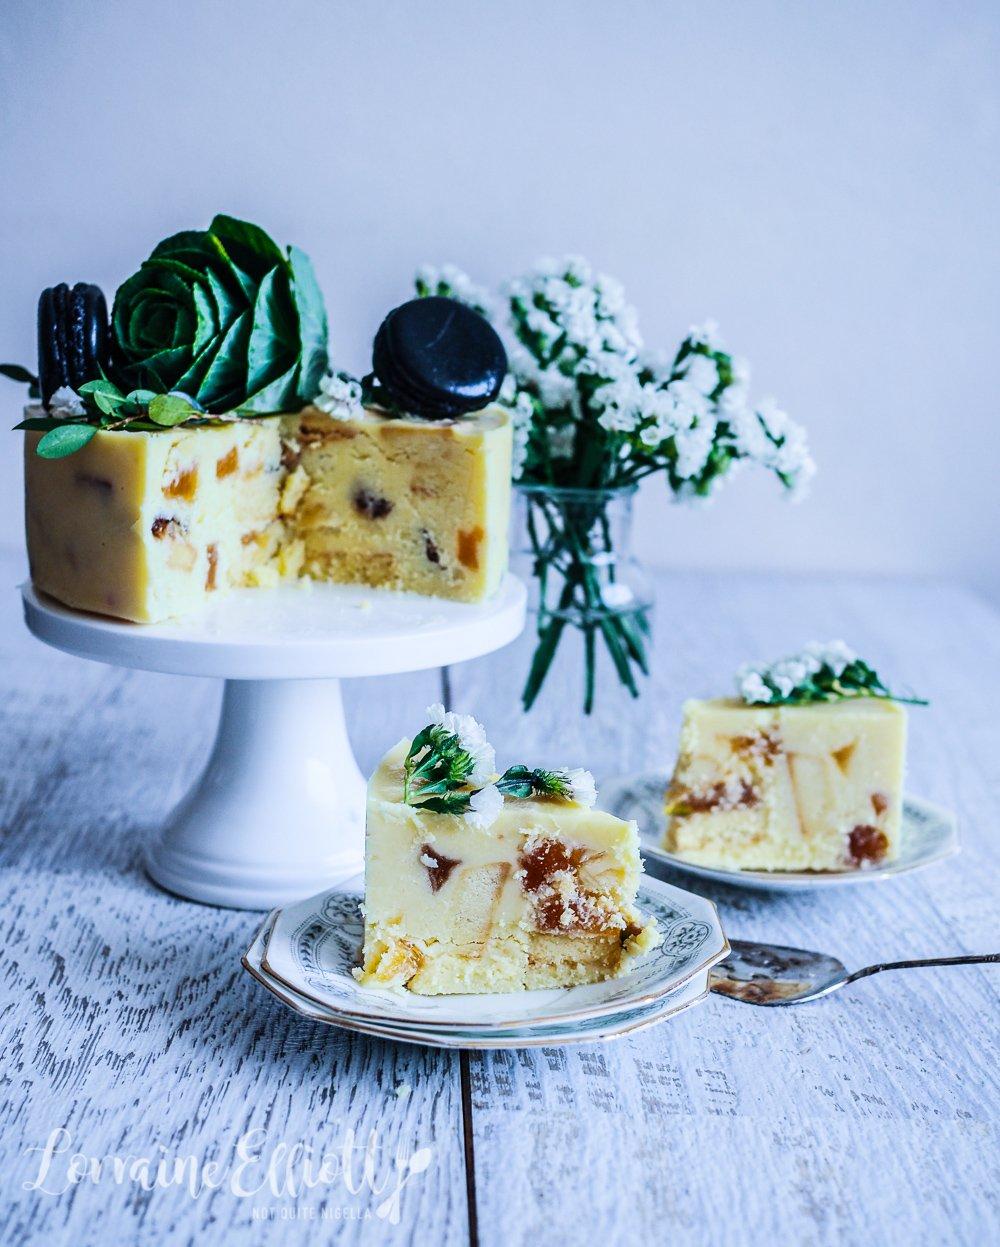 White Chocolate & Ginger Crunch Cake